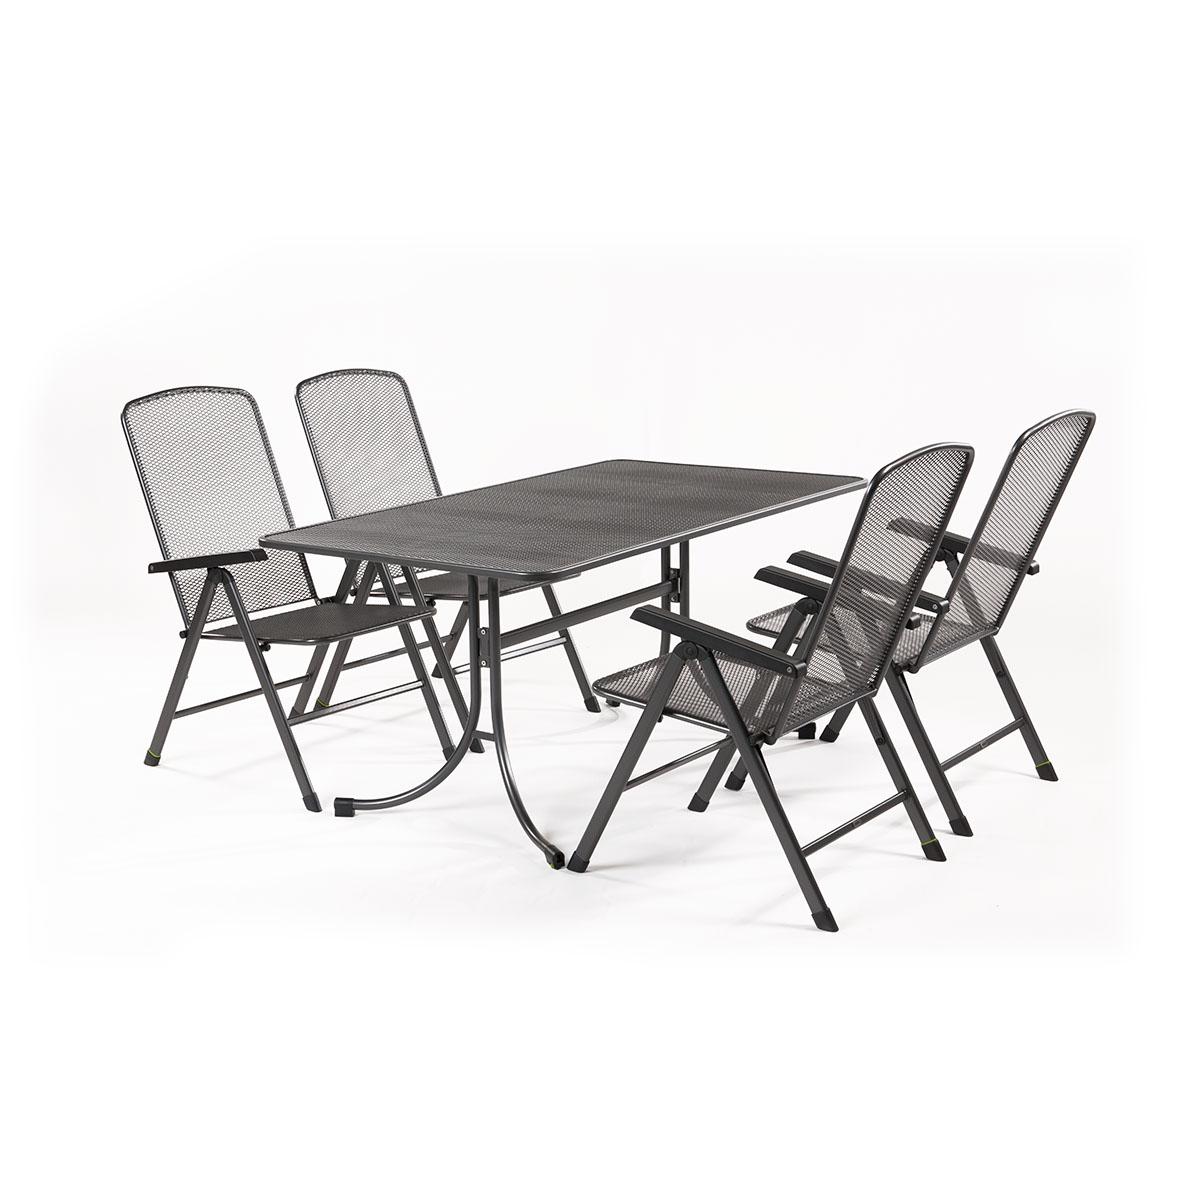 MWH Basani 4+, sestava nábytku z tahokovu (4x pol. křeslo Savoy Basic, 1x stůl Universal 160)